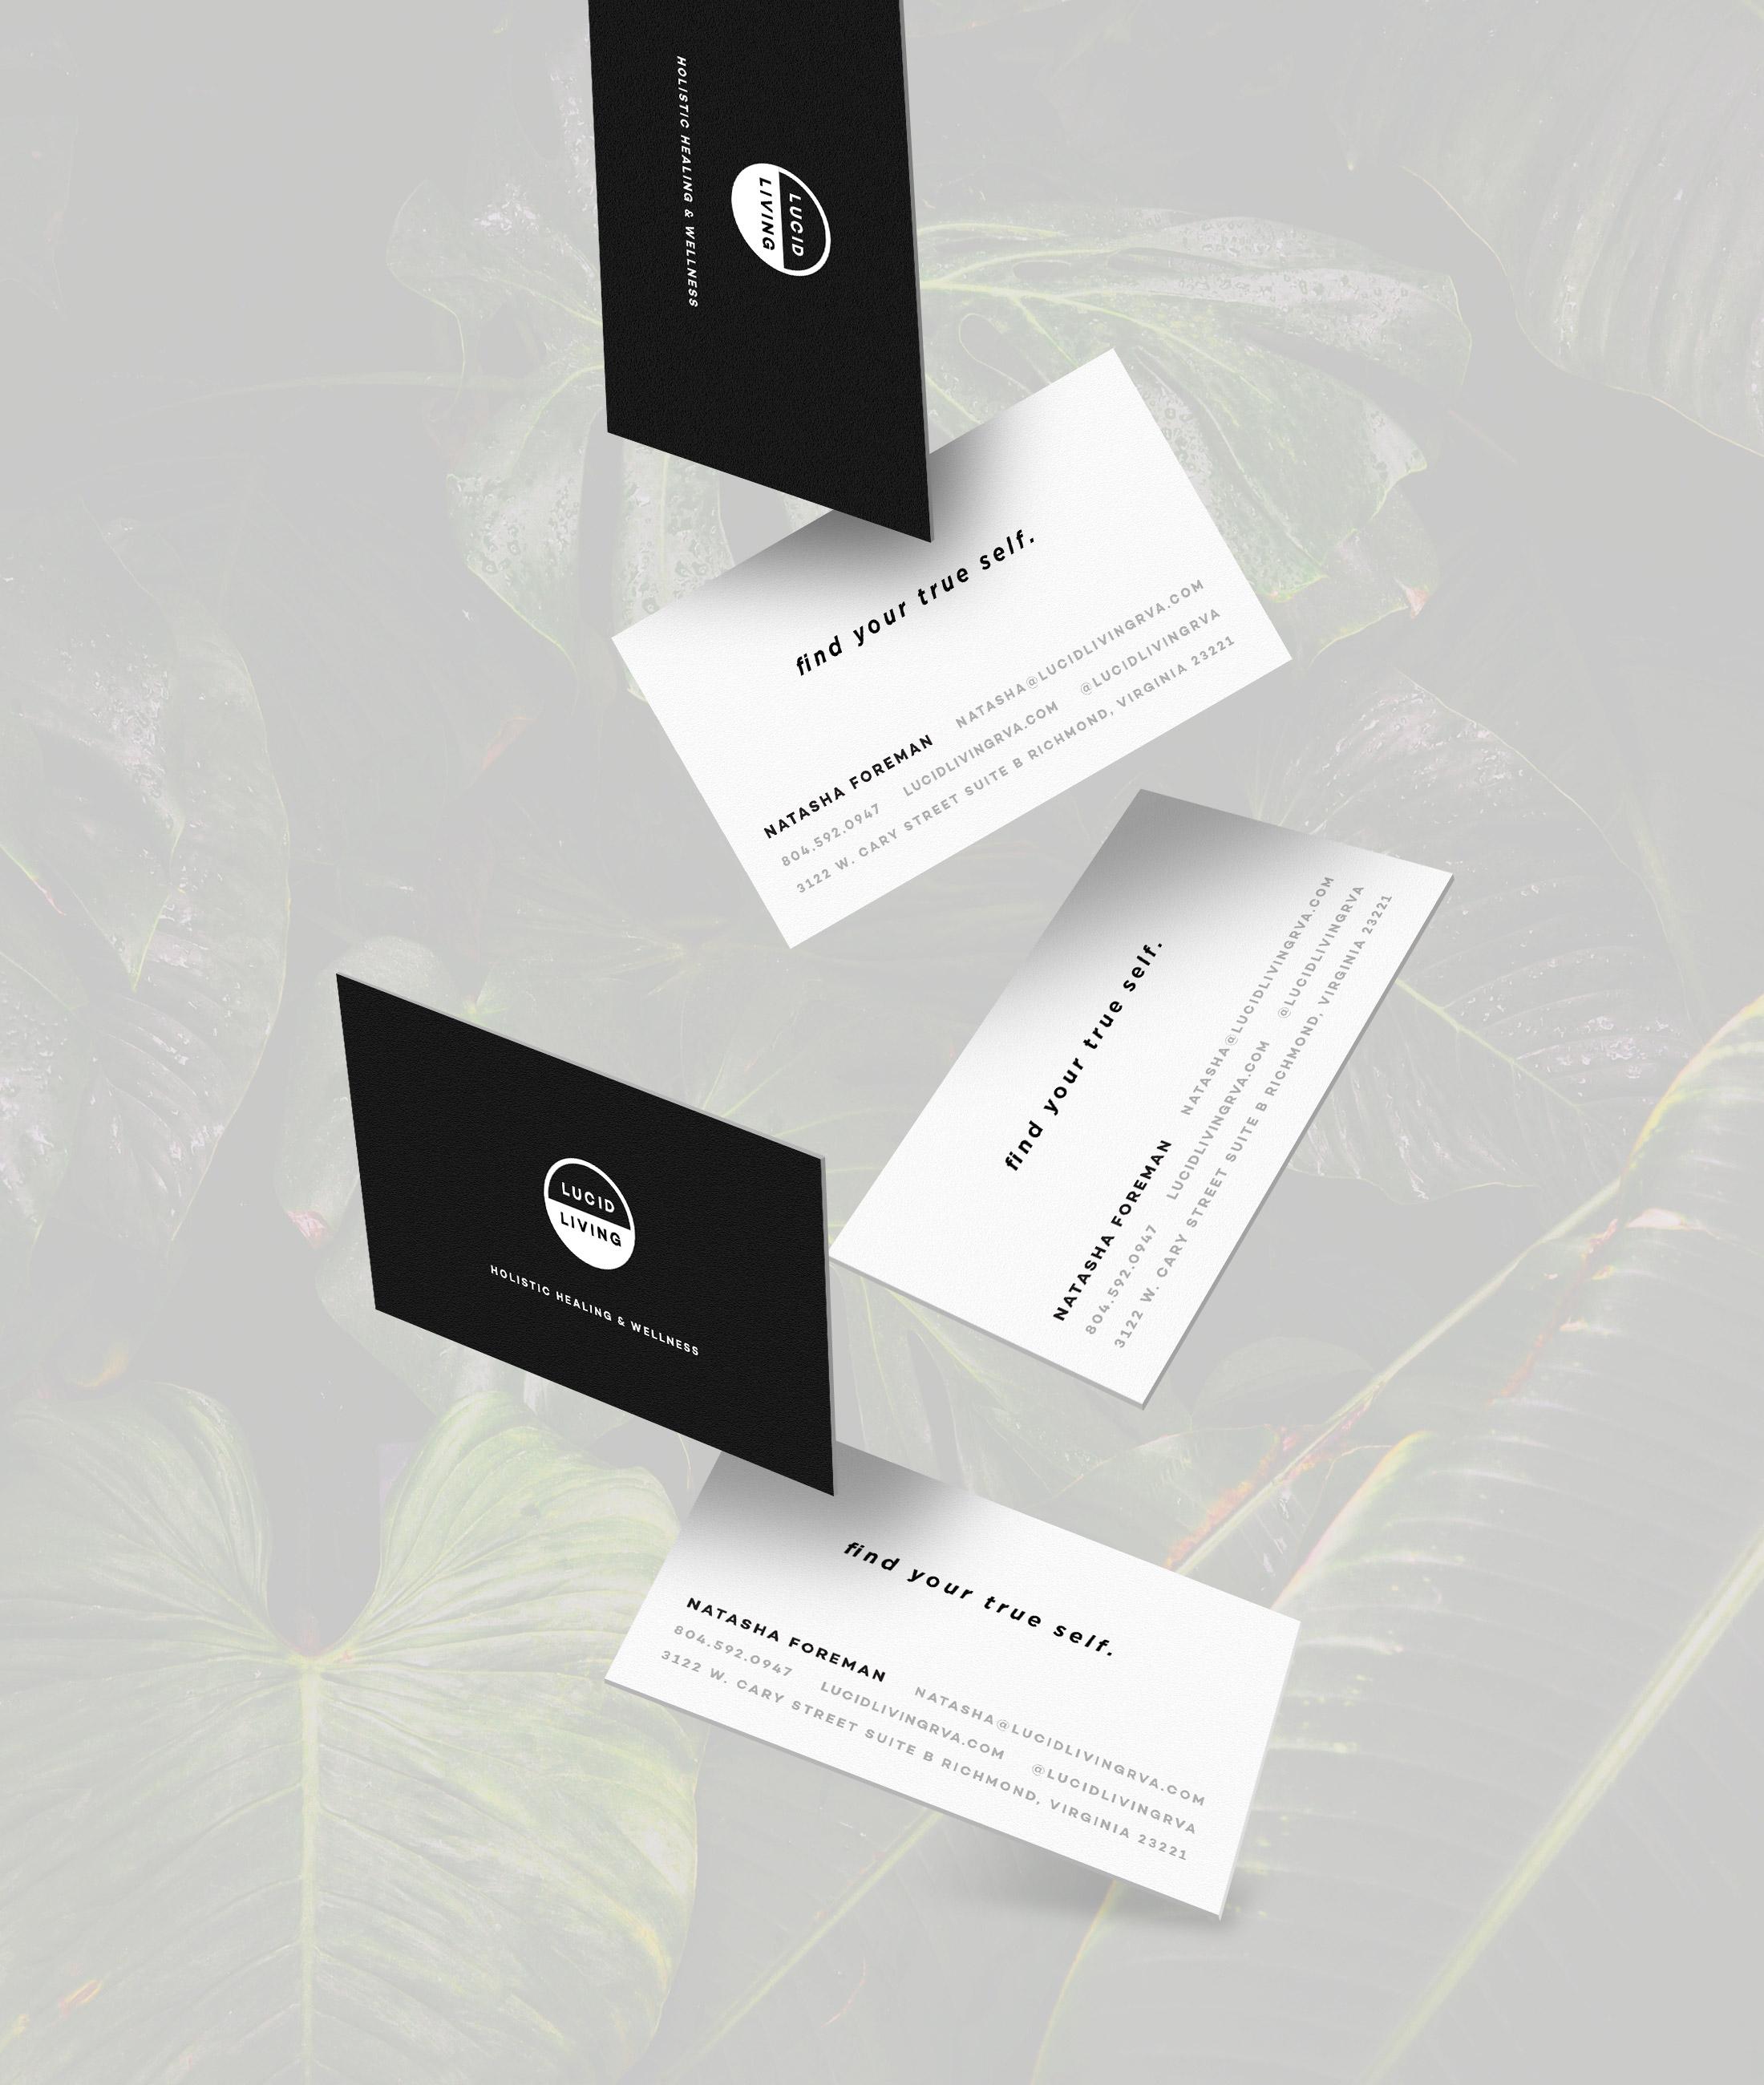 LL-business-card-mockups.jpg